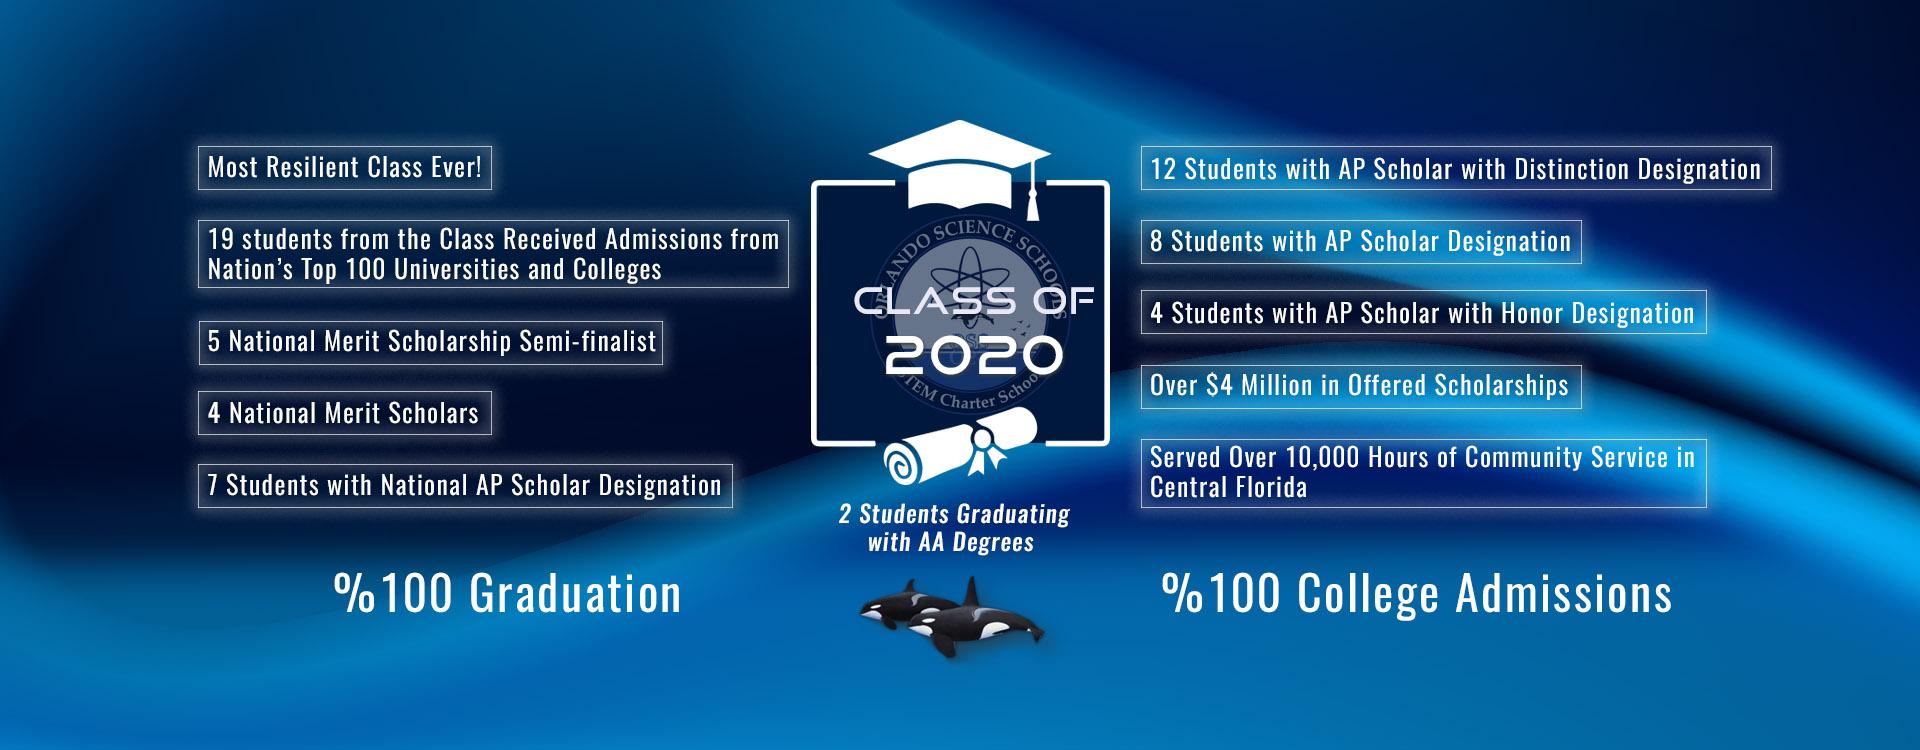 ossh-classof2020